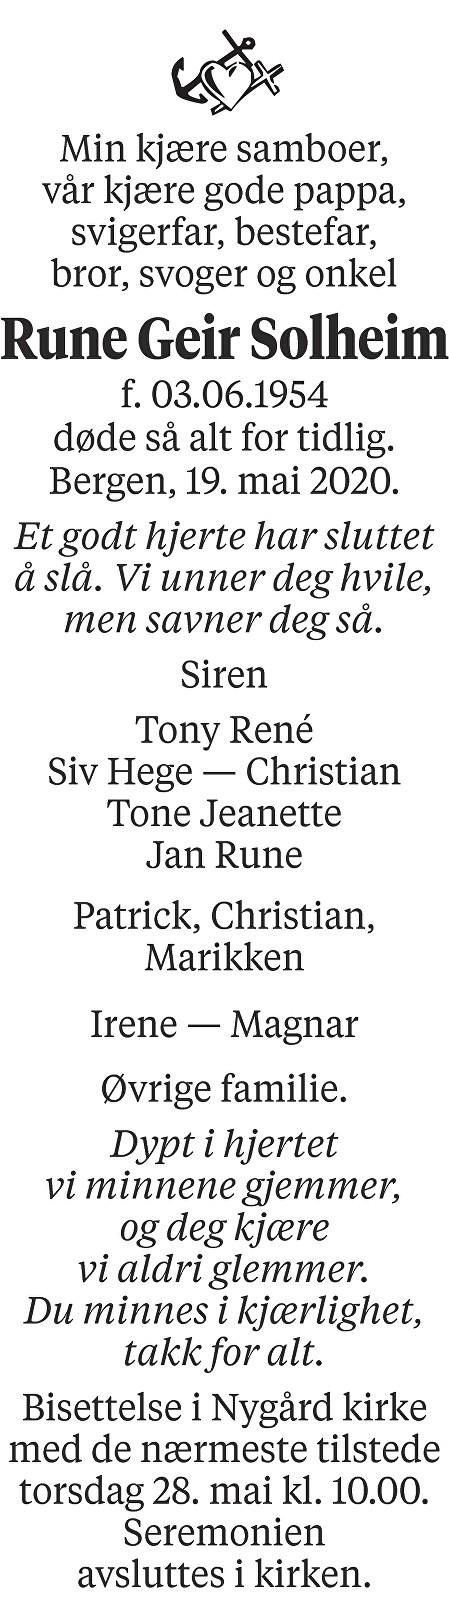 Rune Geir Solheim Dødsannonse